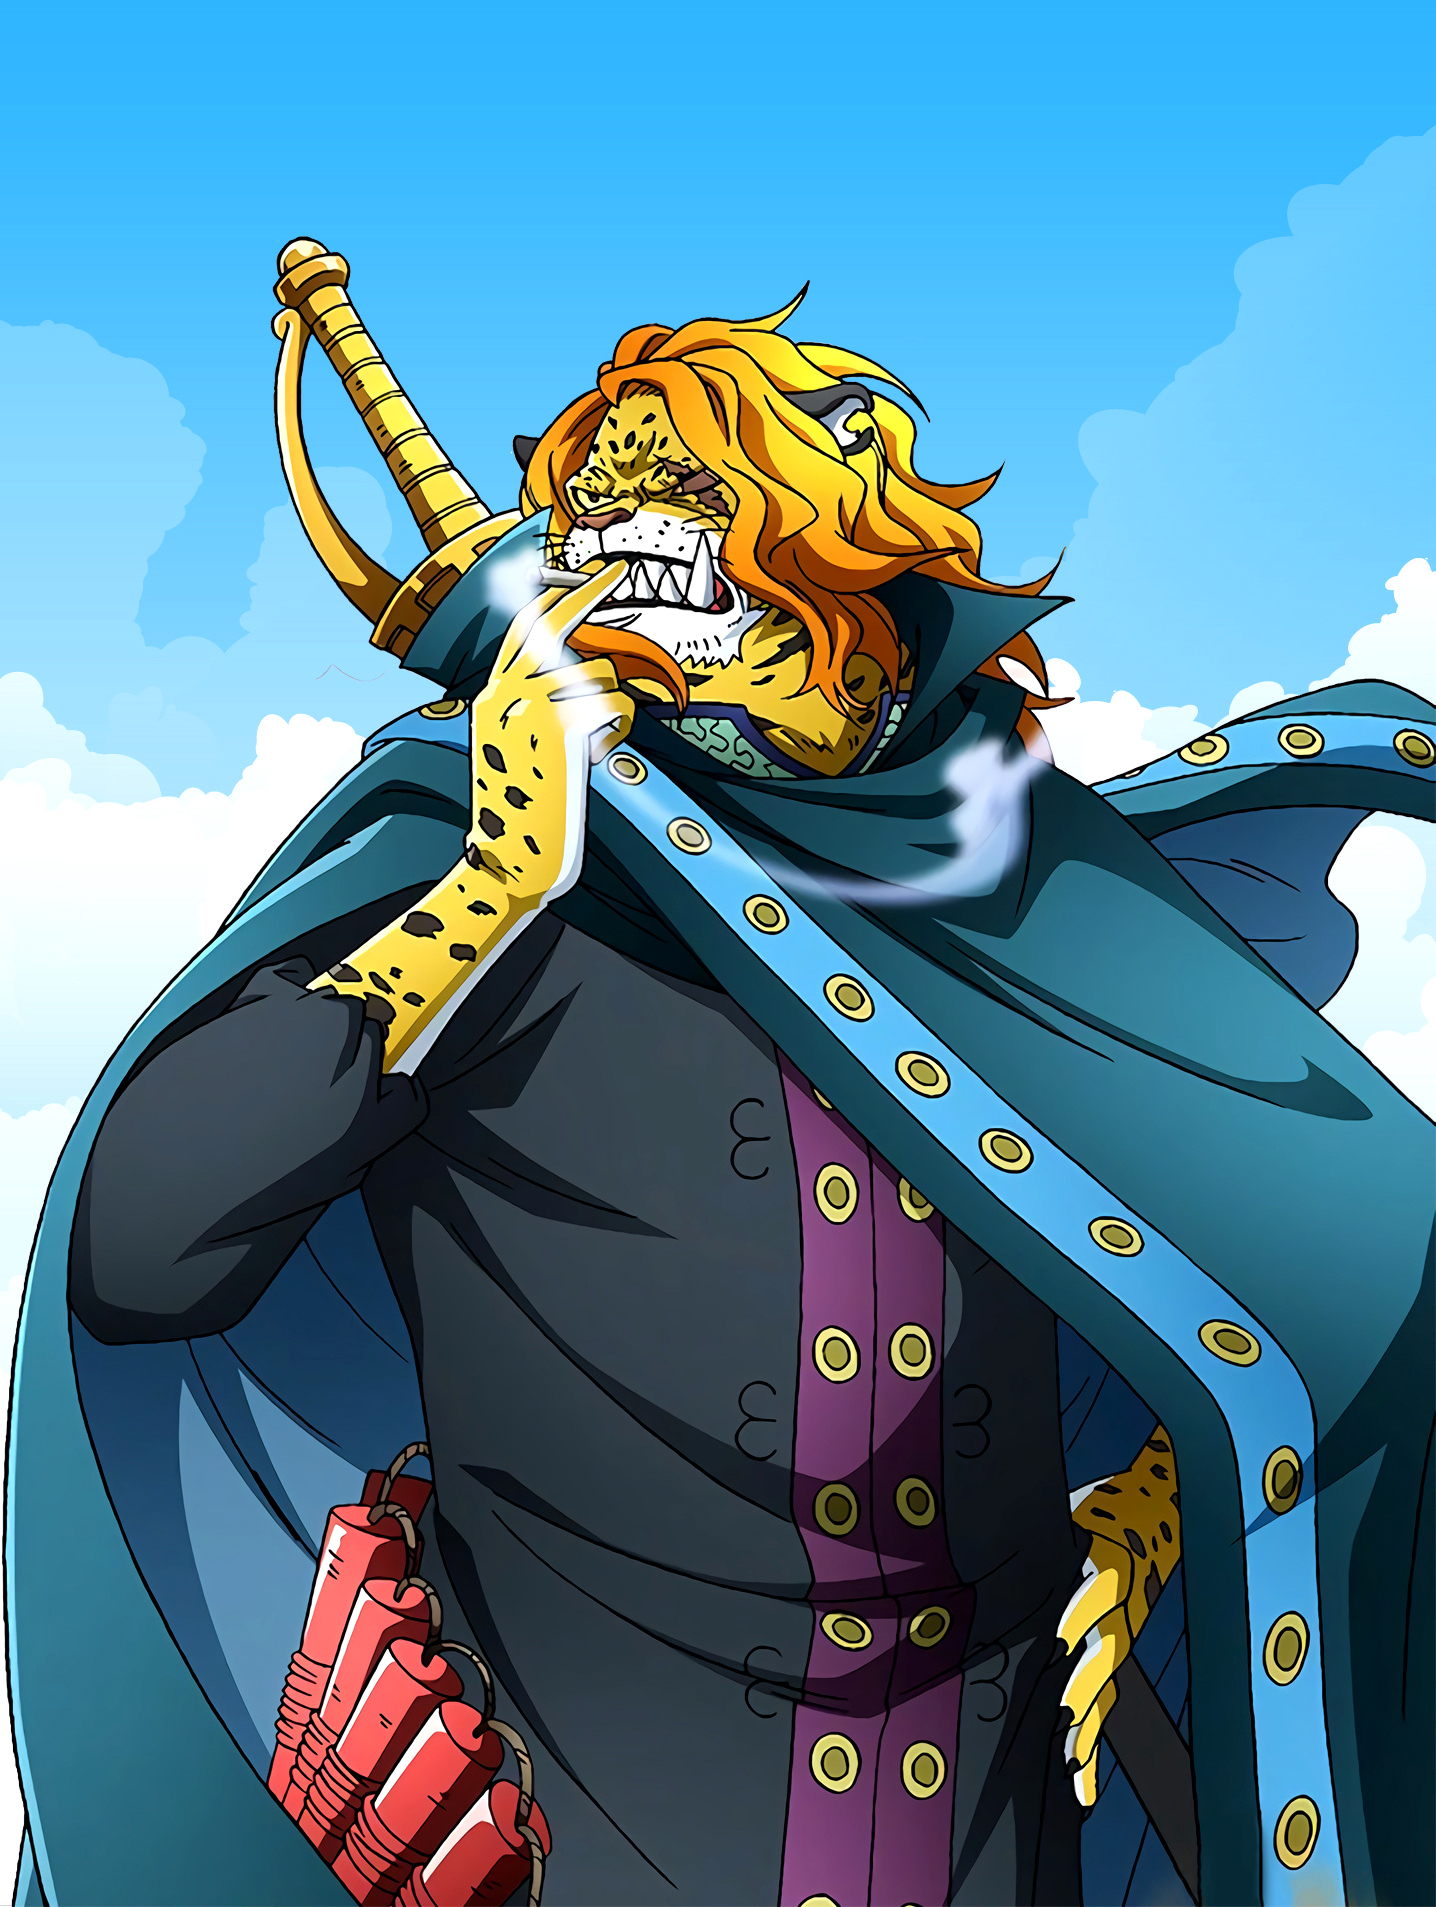 Pedro (One Piece) Image #2313063 - Zerochan Anime Image Board